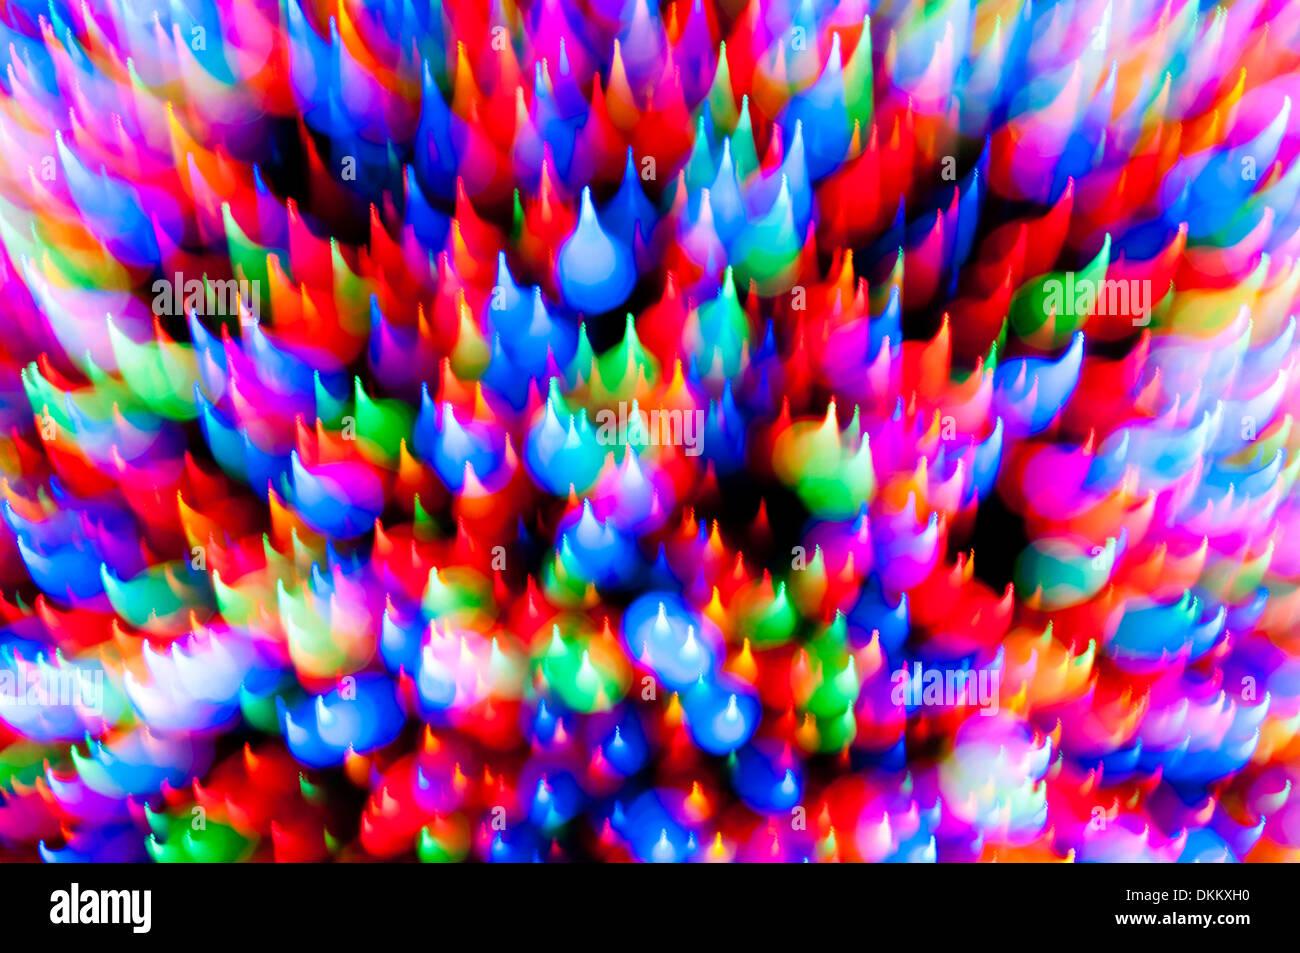 Weihnachtsbaum Lichter Bewegungsunschärfe abstrakt Stockbild